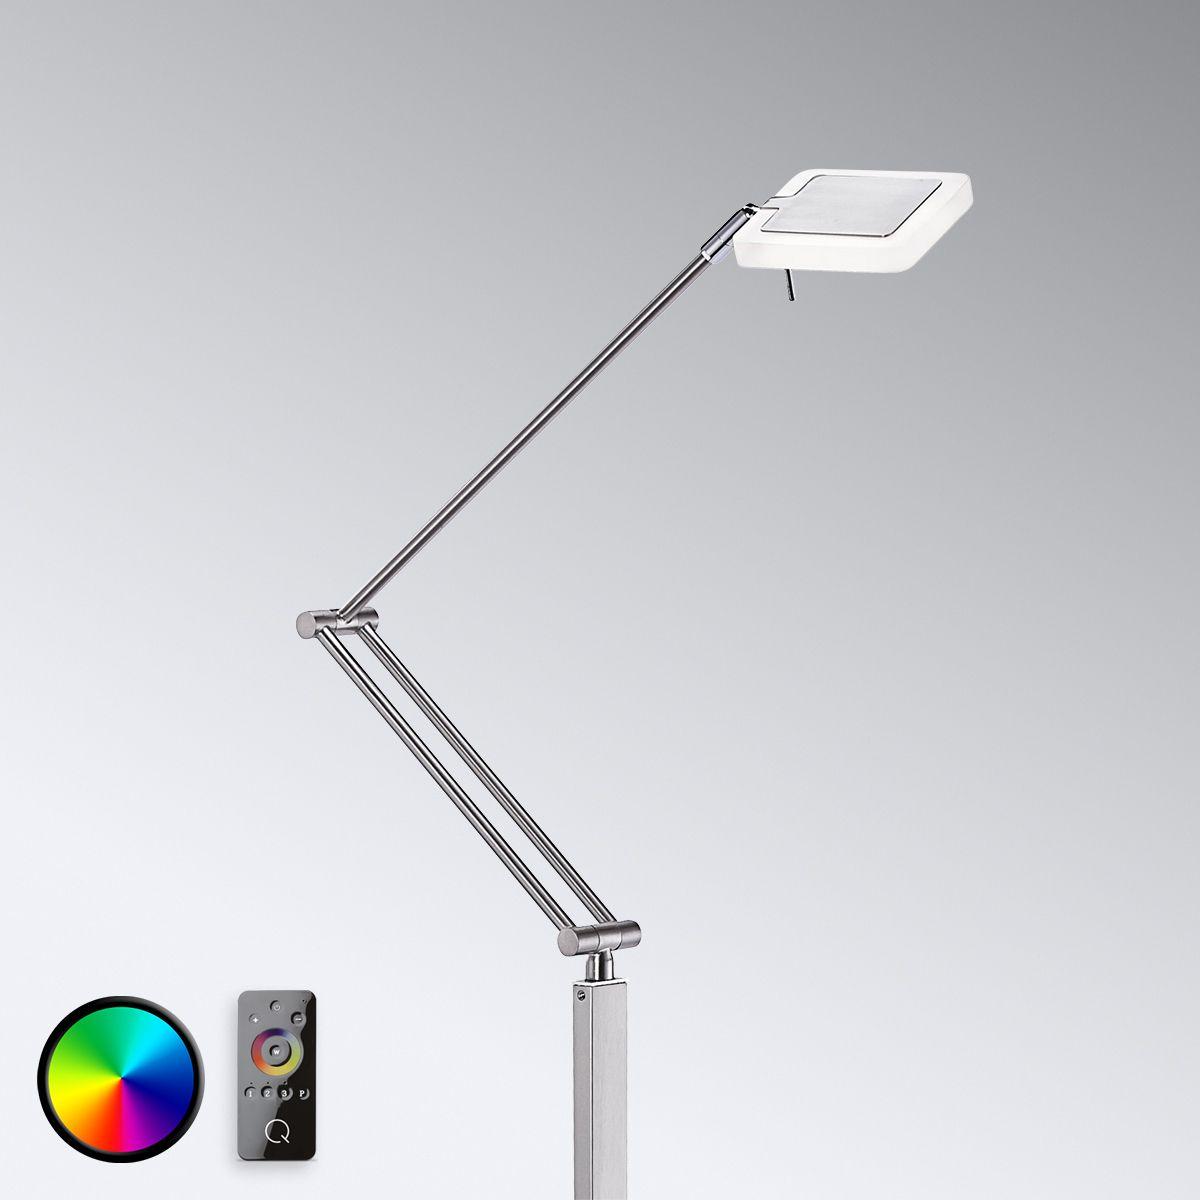 vidal - led-stehlampe mit fernbed., zigbee-fähig jetzt bestellen